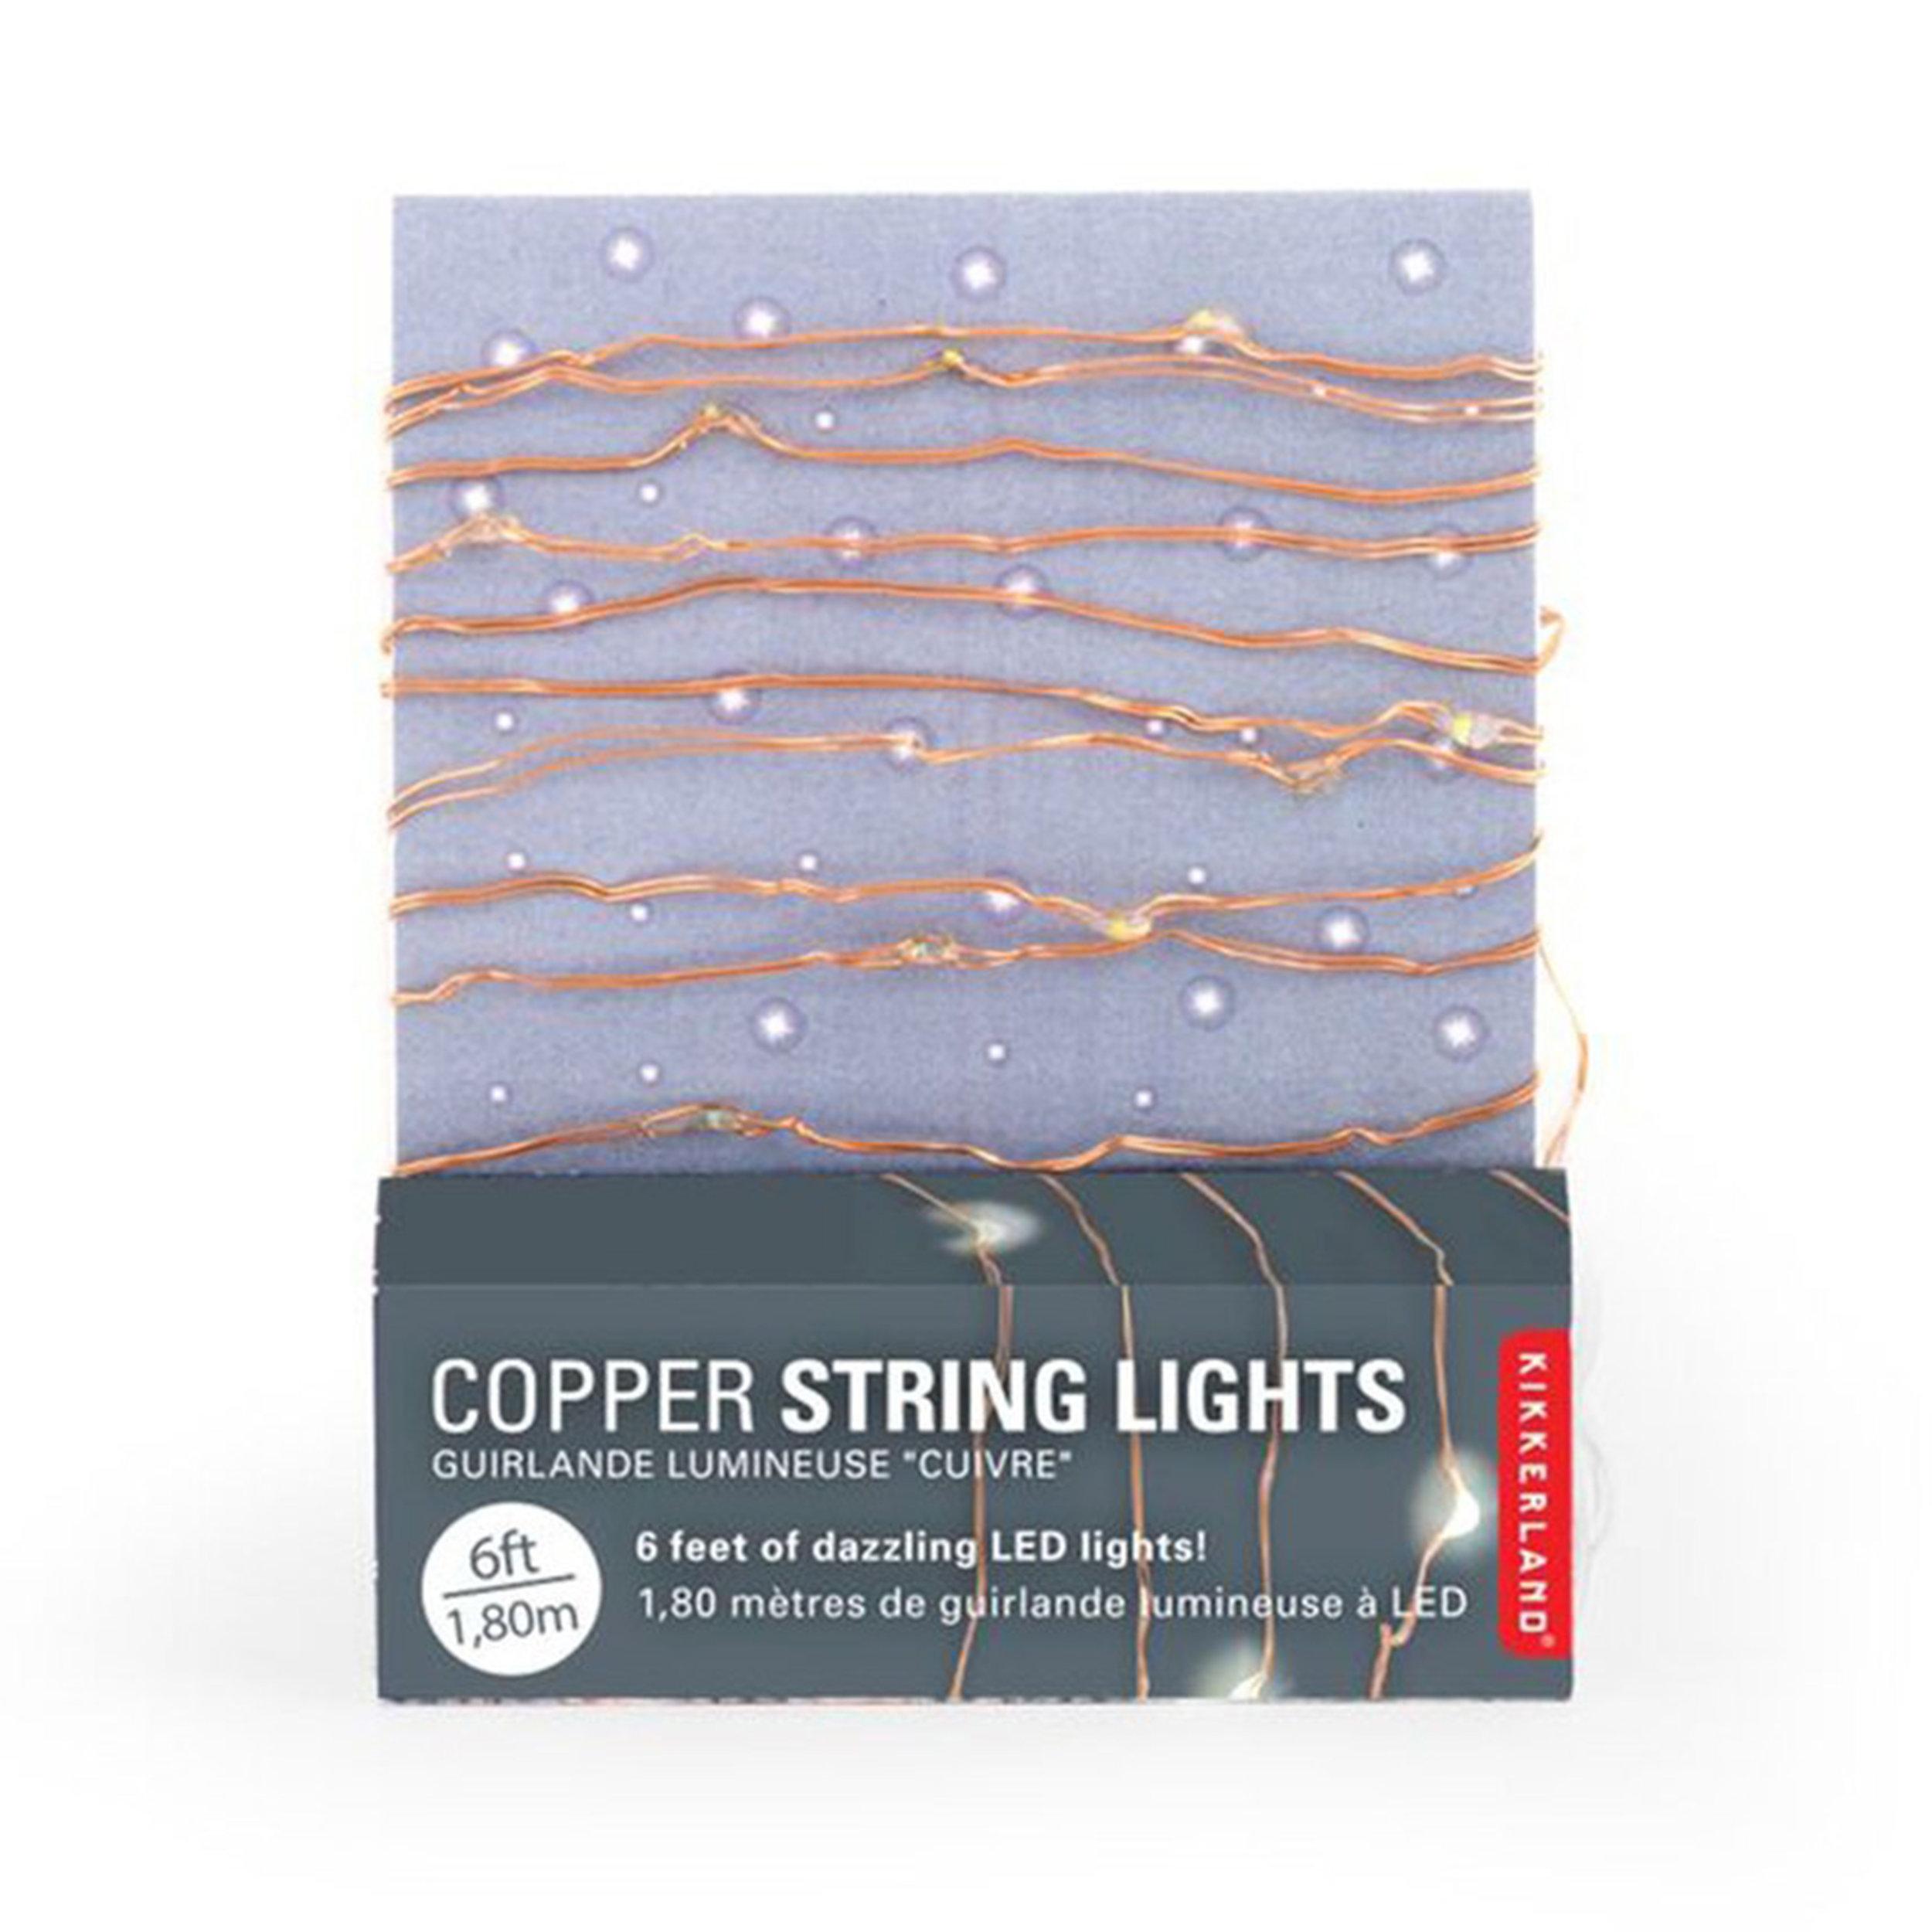 COPPER STRING LIGHTS,  £9.50